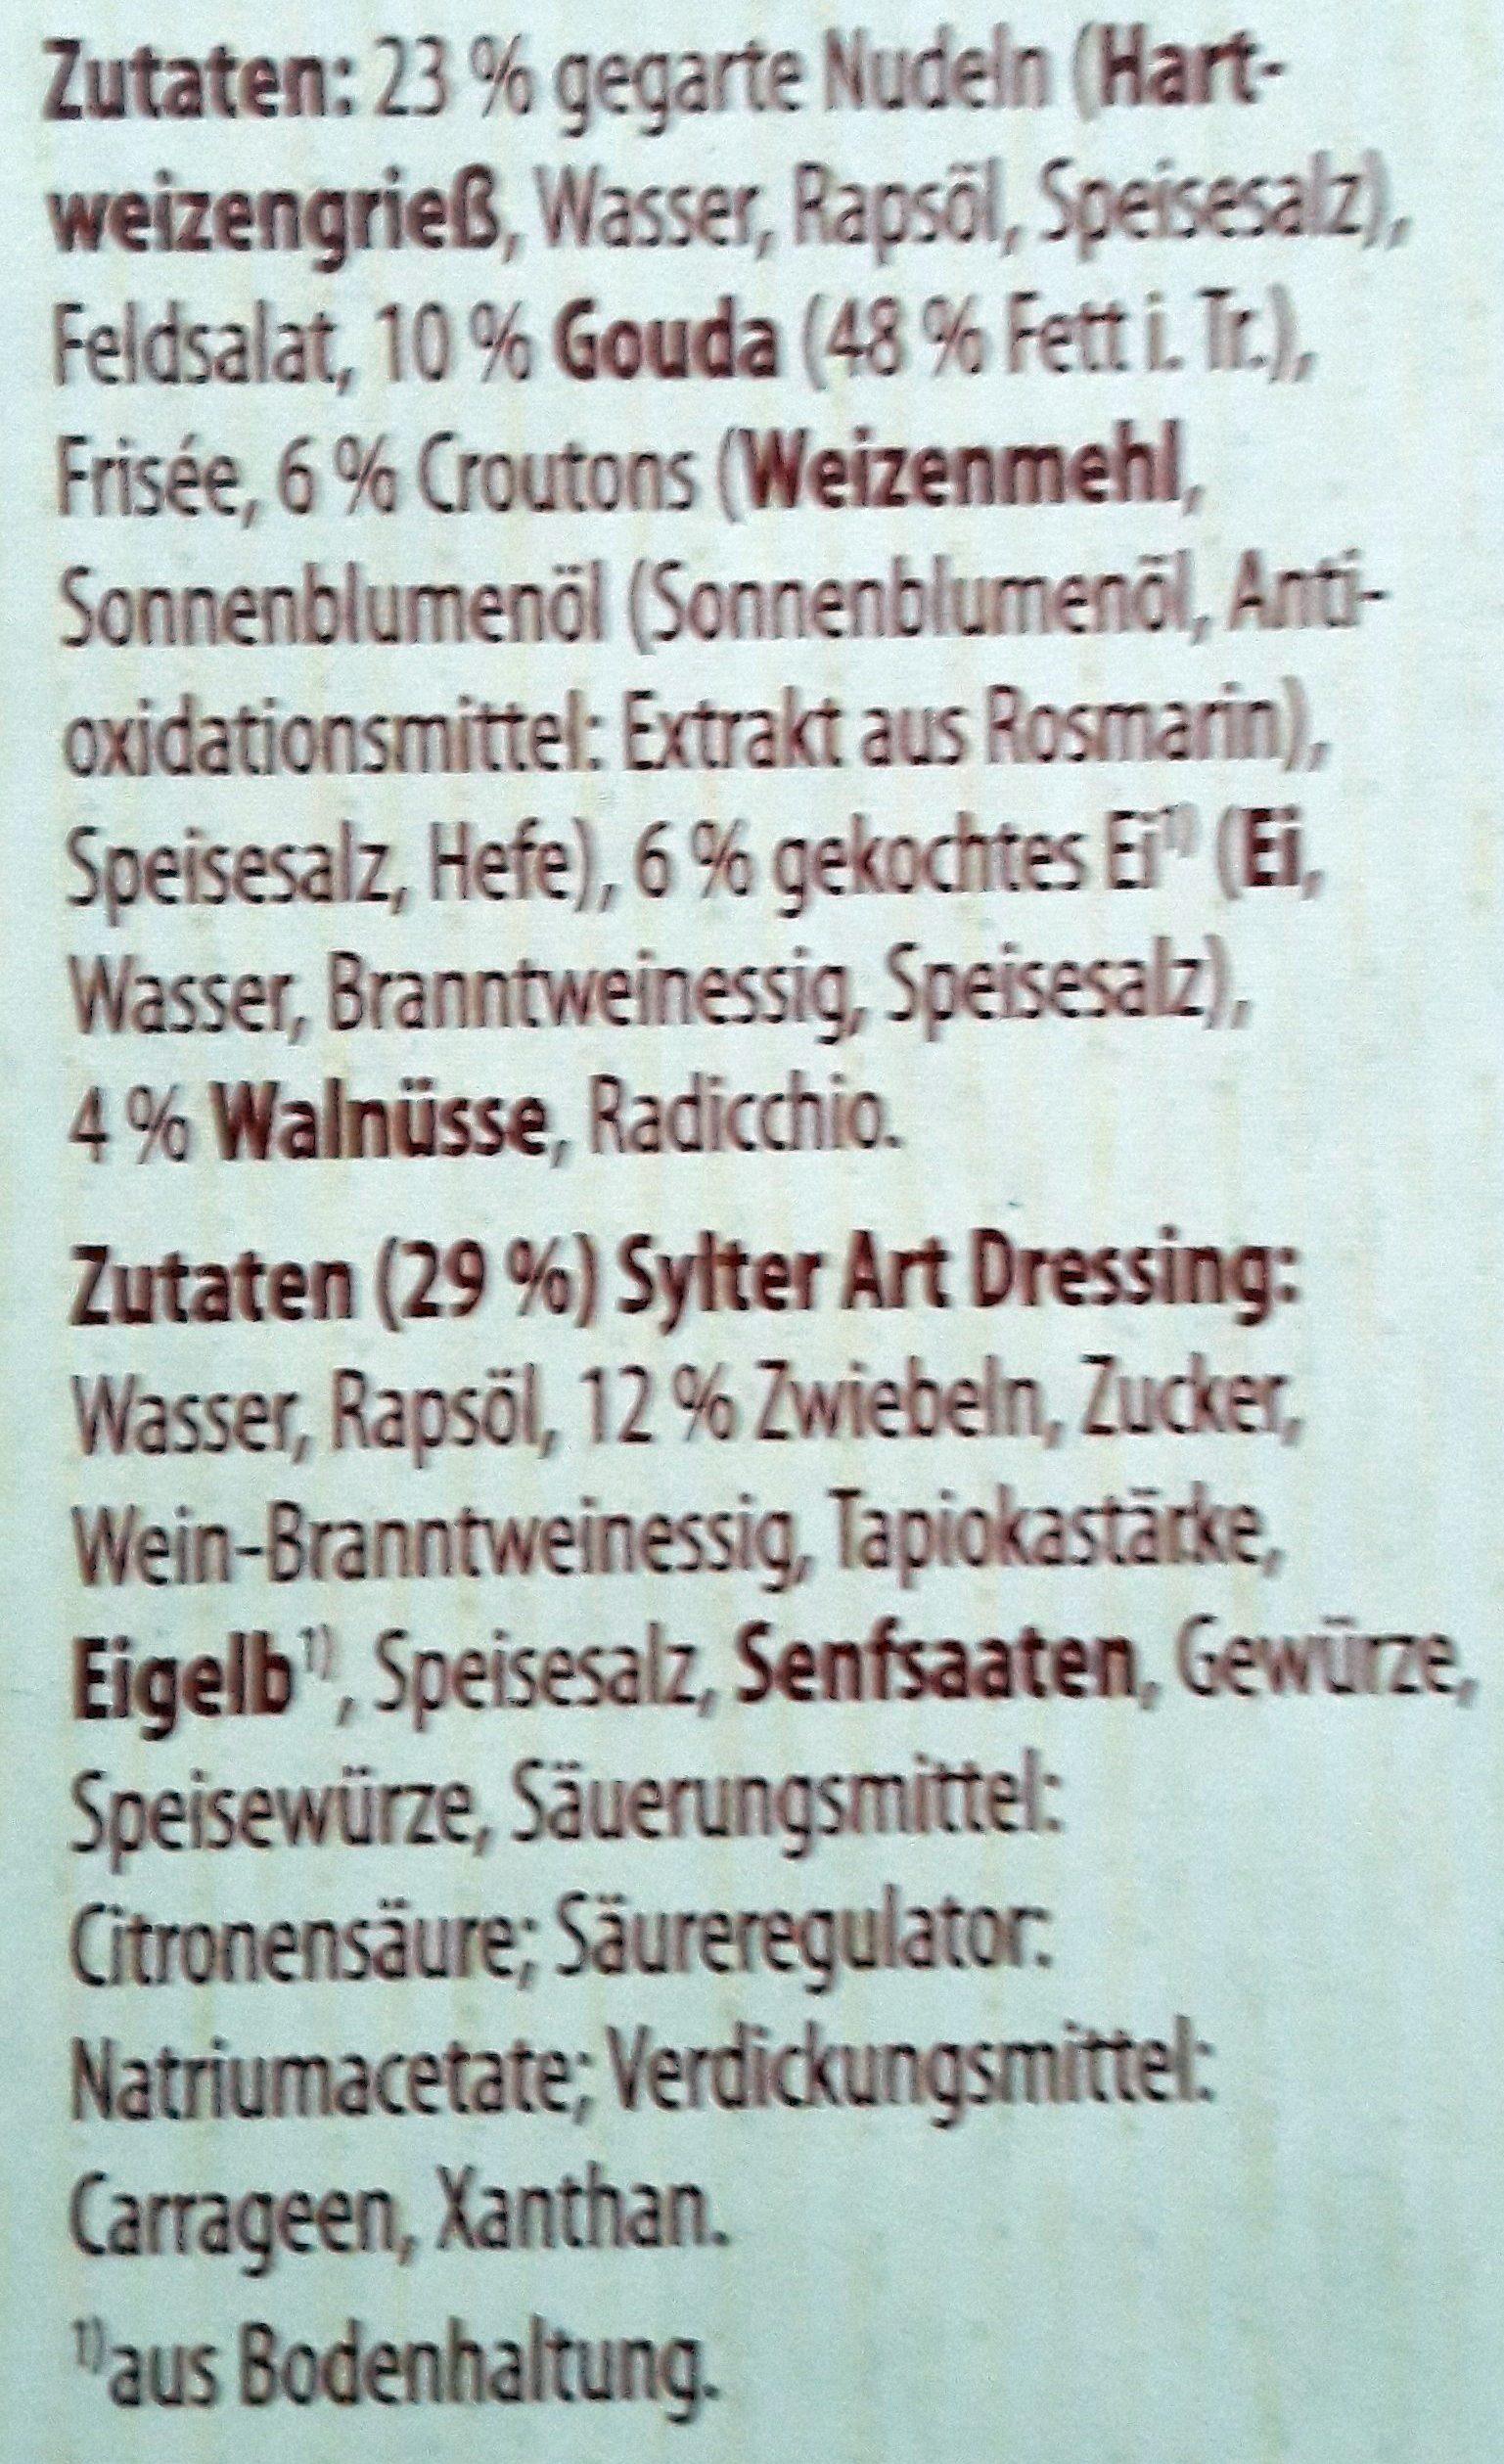 ORZO SALAT MIT KÄSE, CROUTONS UND STYLER ART DRESSING - Ingrédients - fr